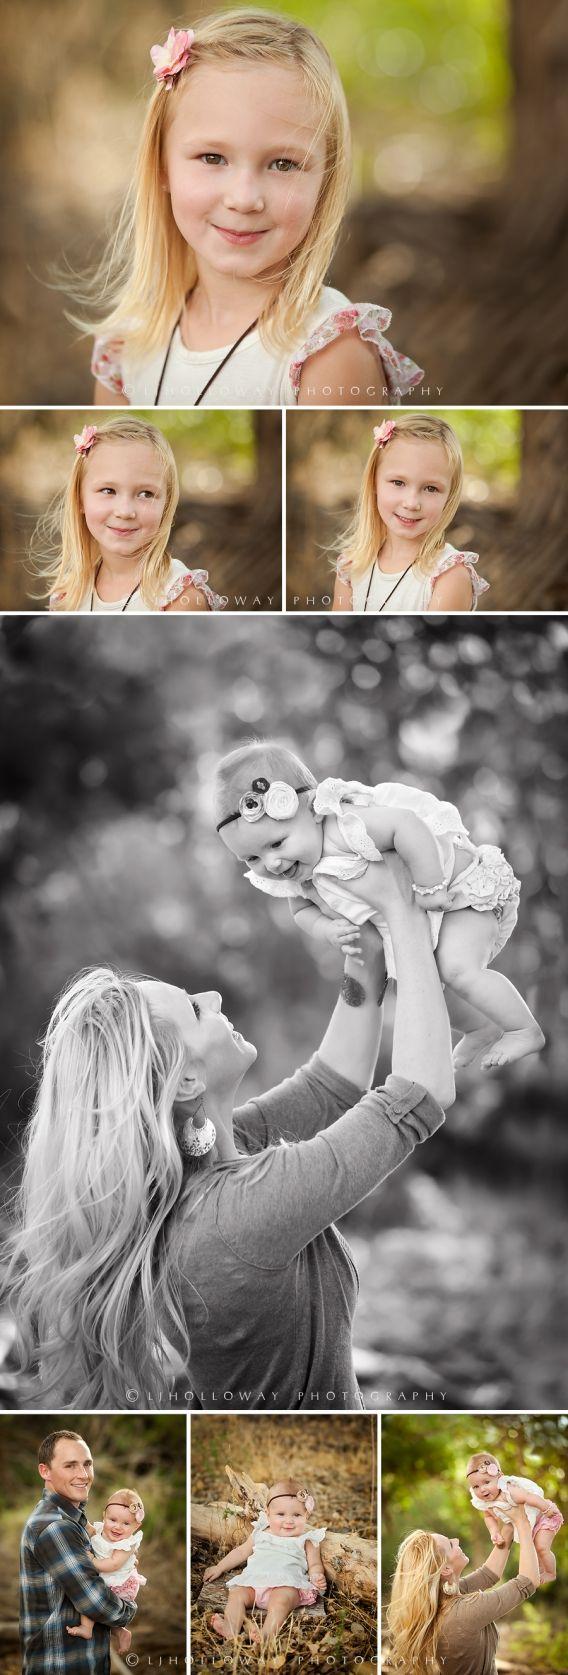 P_Family_Blog03_Kingman Arizona Child And Family And Baby Photographer_Las Vegas Nevada Child And Family And Baby Photographer